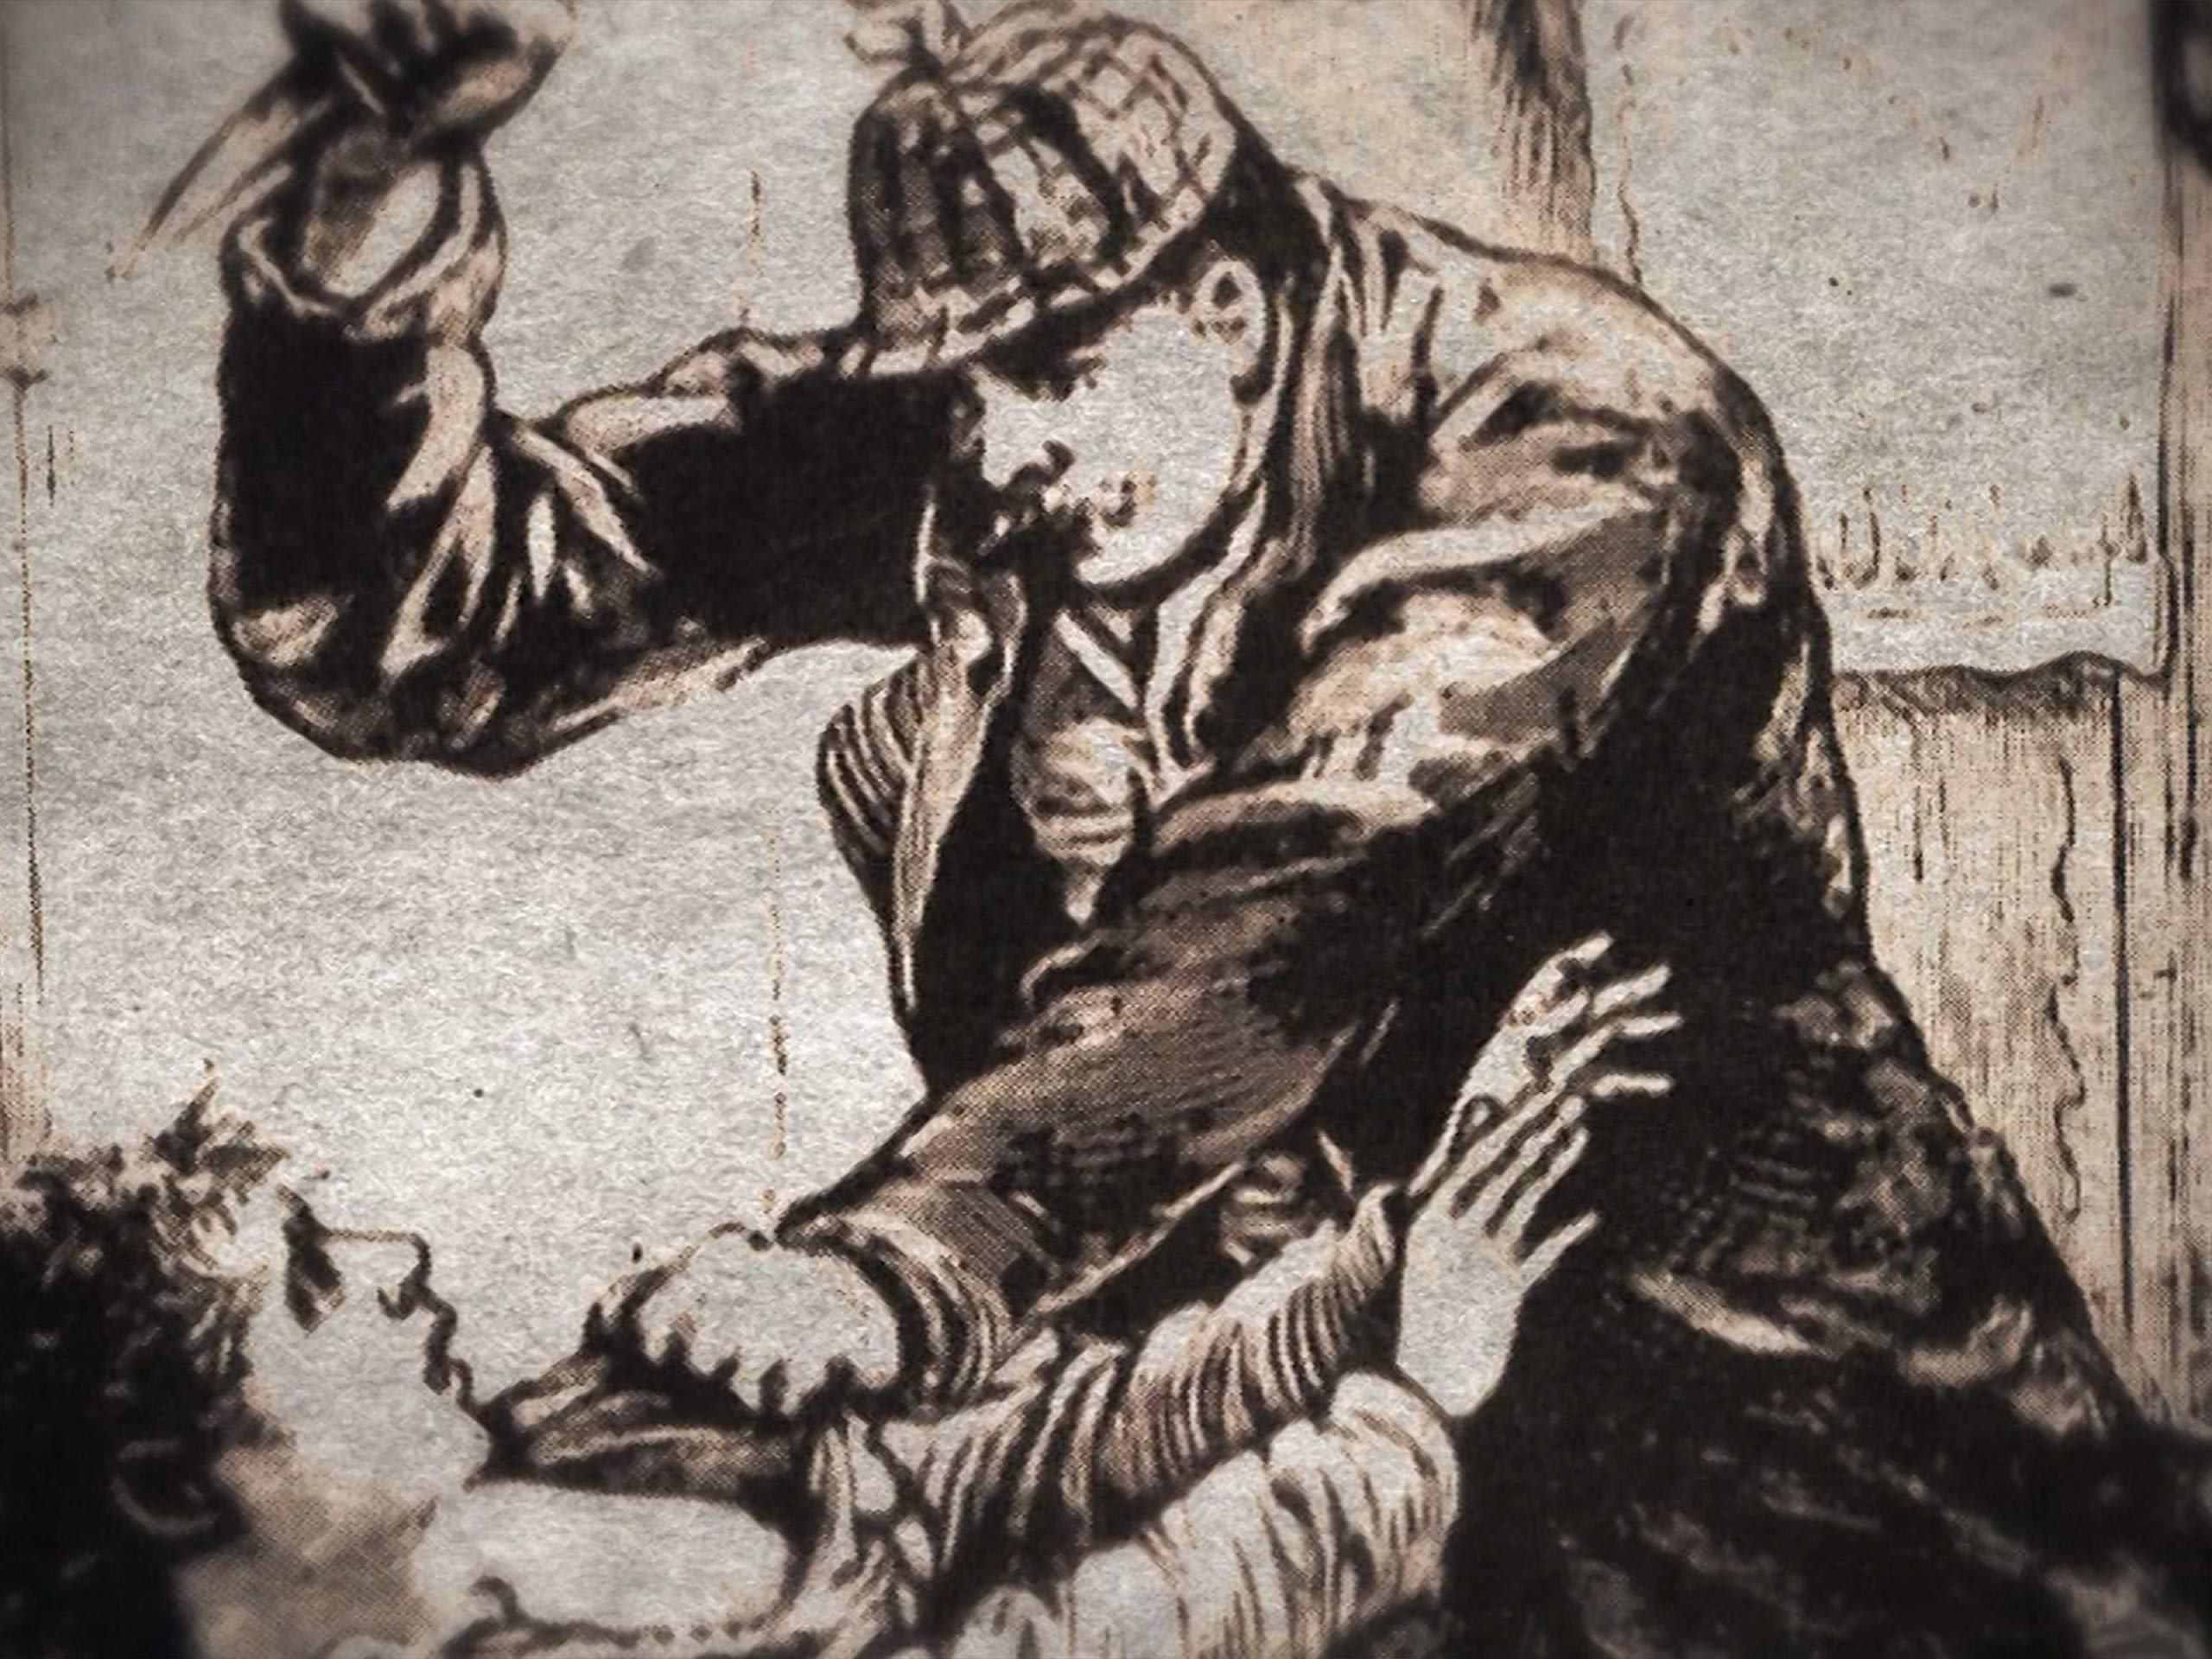 Amazon.co.jp: アメリカン・リッパー猟奇連続殺人の真相: Jeff Mudgett ...